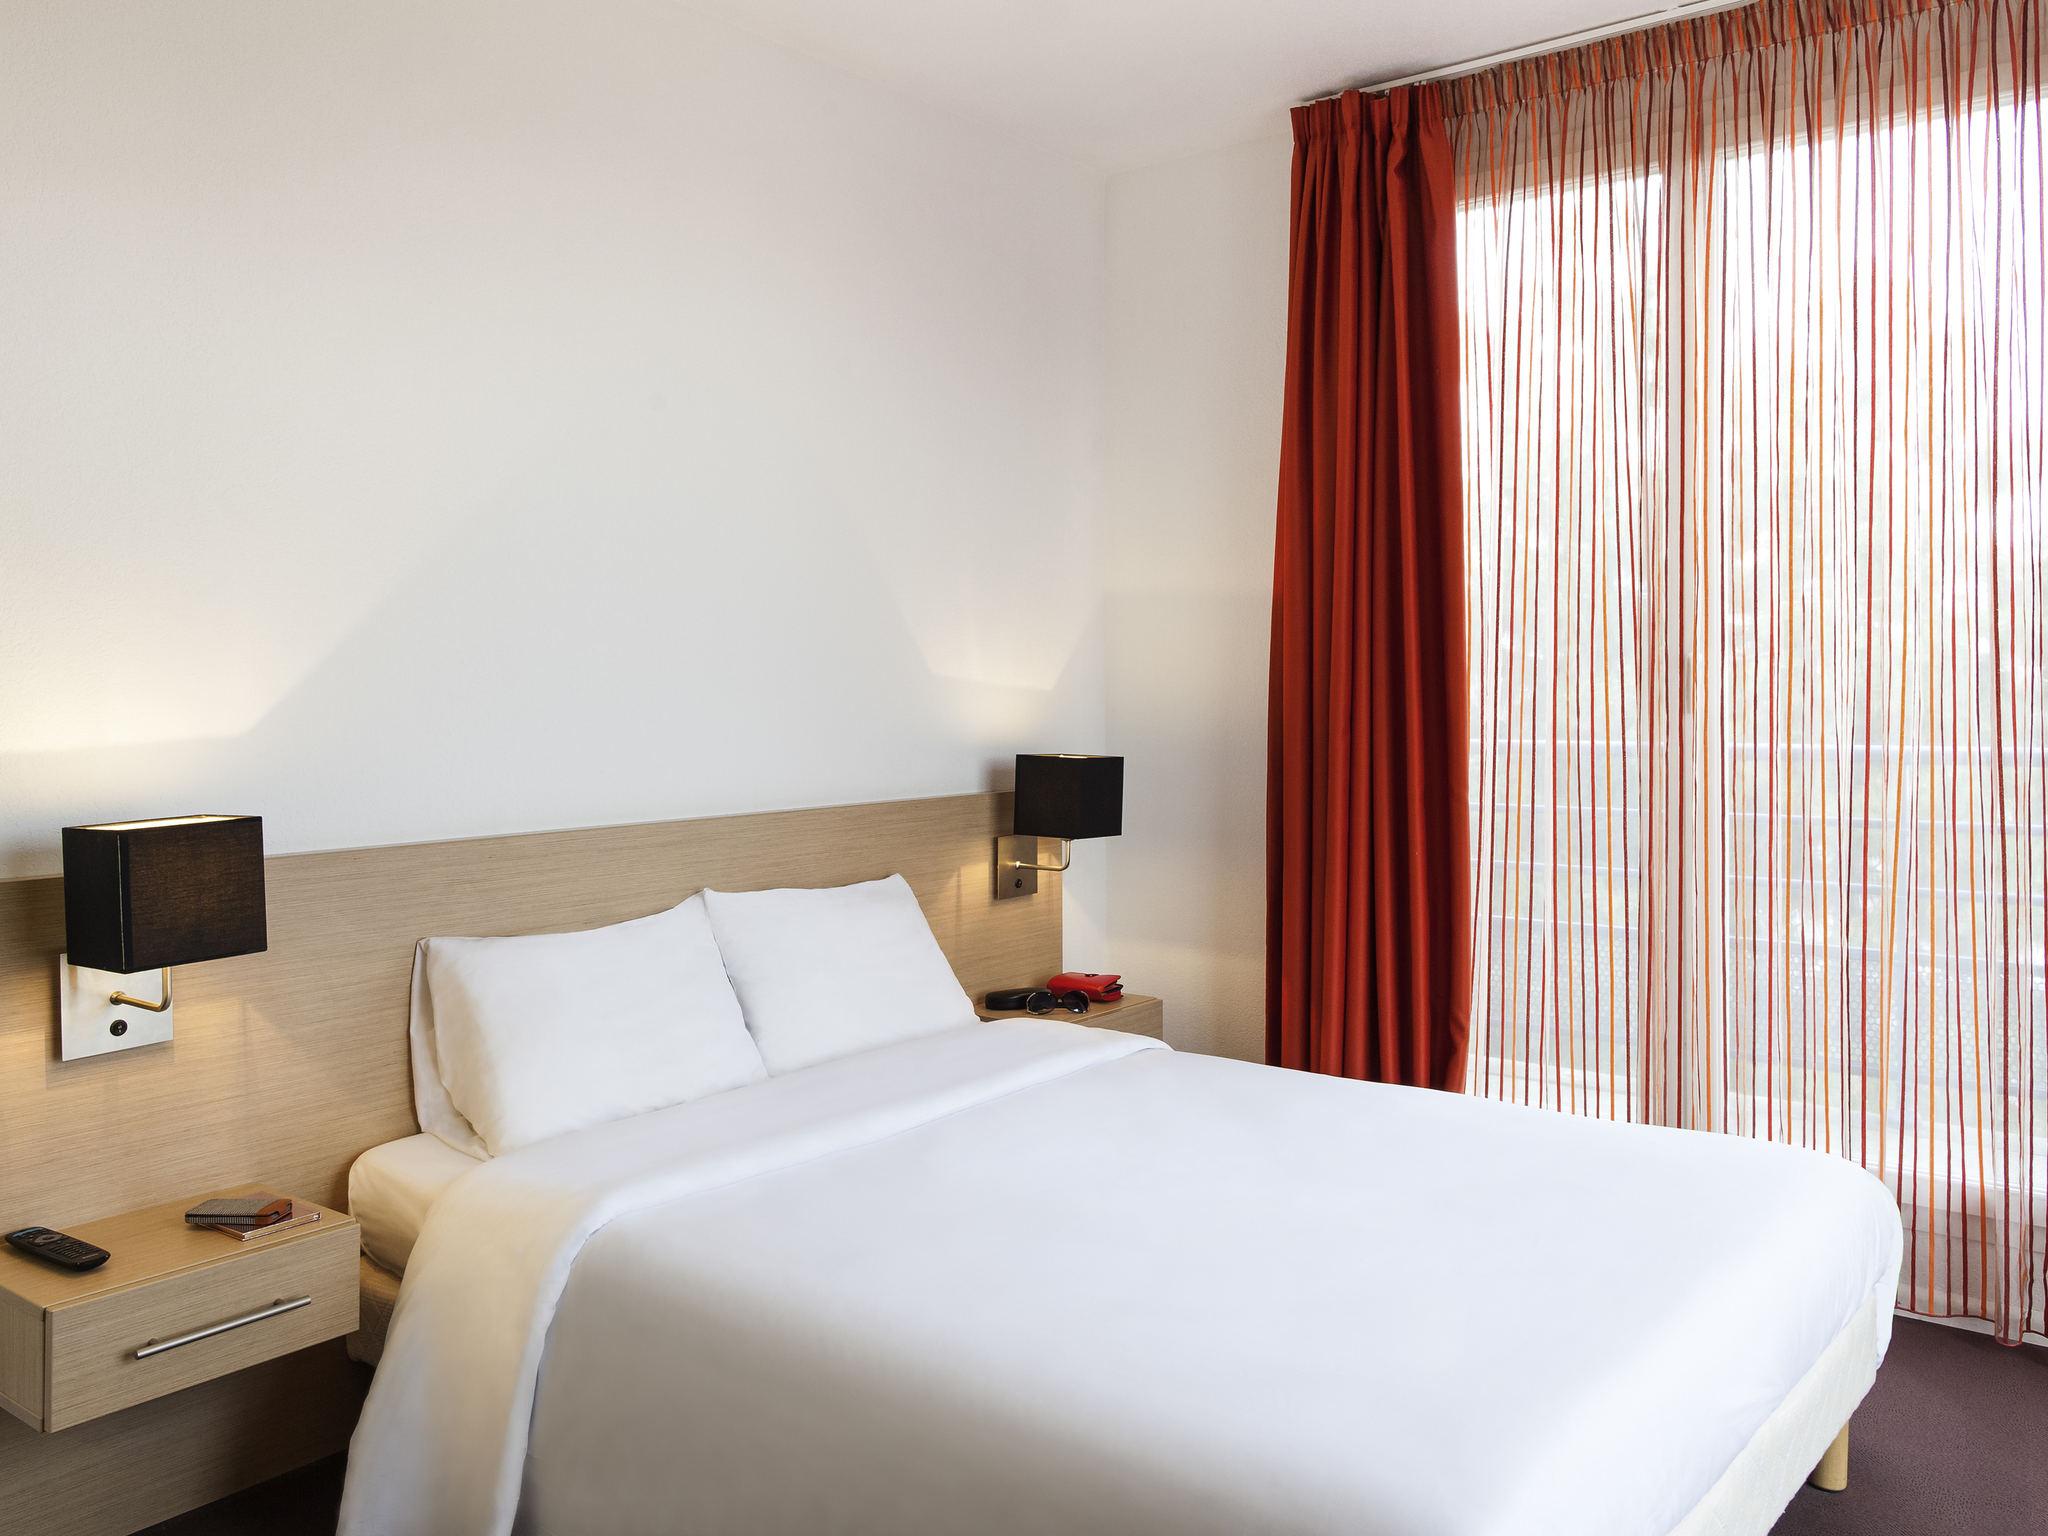 Hotel - Aparthotel Adagio access Saint Louis Bâle